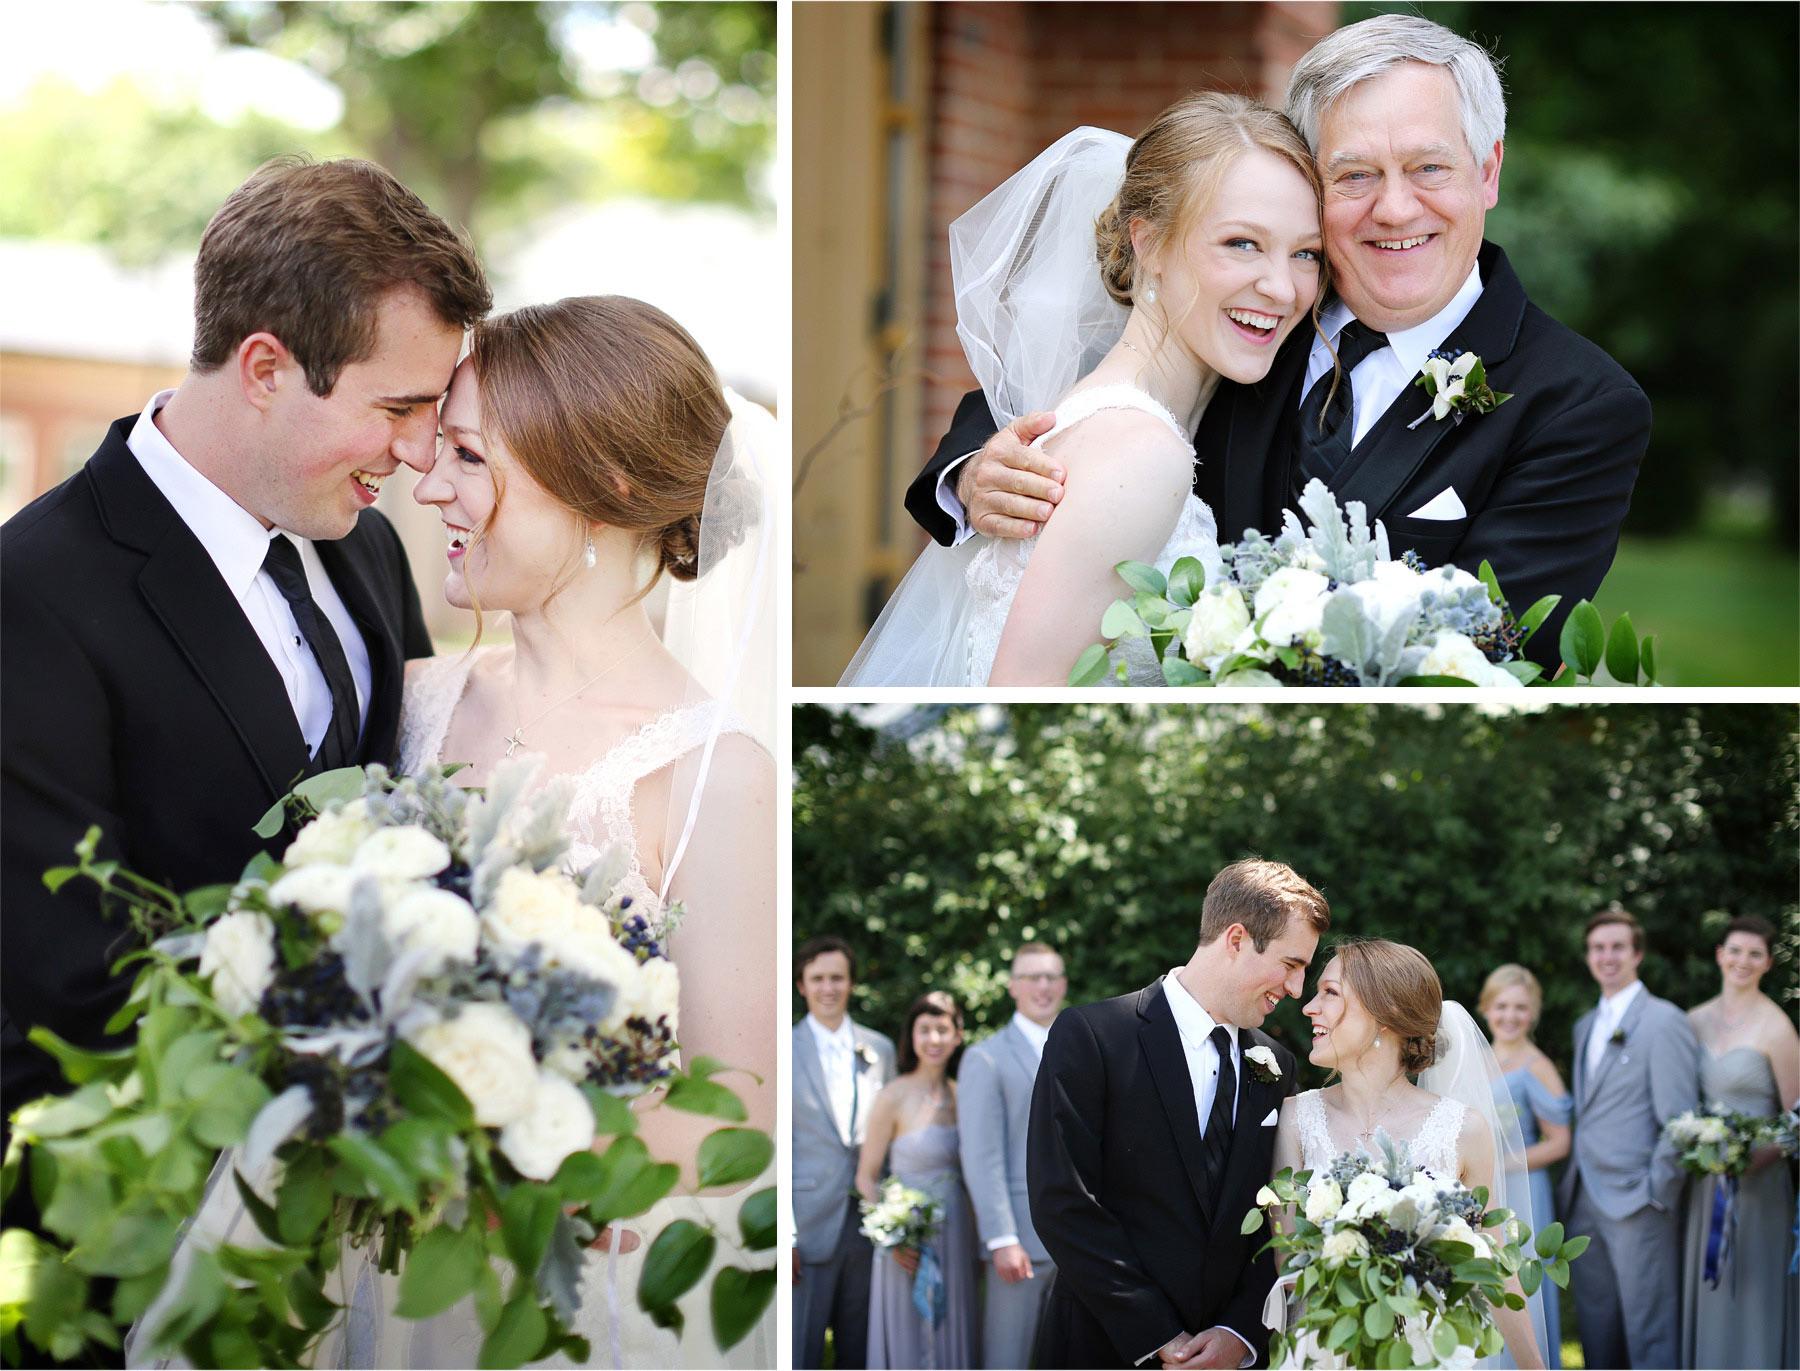 09-Edina-Minnesota-Wedding-Photographer-by-Andrew-Vick-Photography-Summer-Our-Lady-of-Grace-Catholic-Parish-Church-Bride-Groom-Embrace-Father-Parents-Bridal-Party-Groomsmen-Bridesmaids-Betsy-and-Jon.jpg